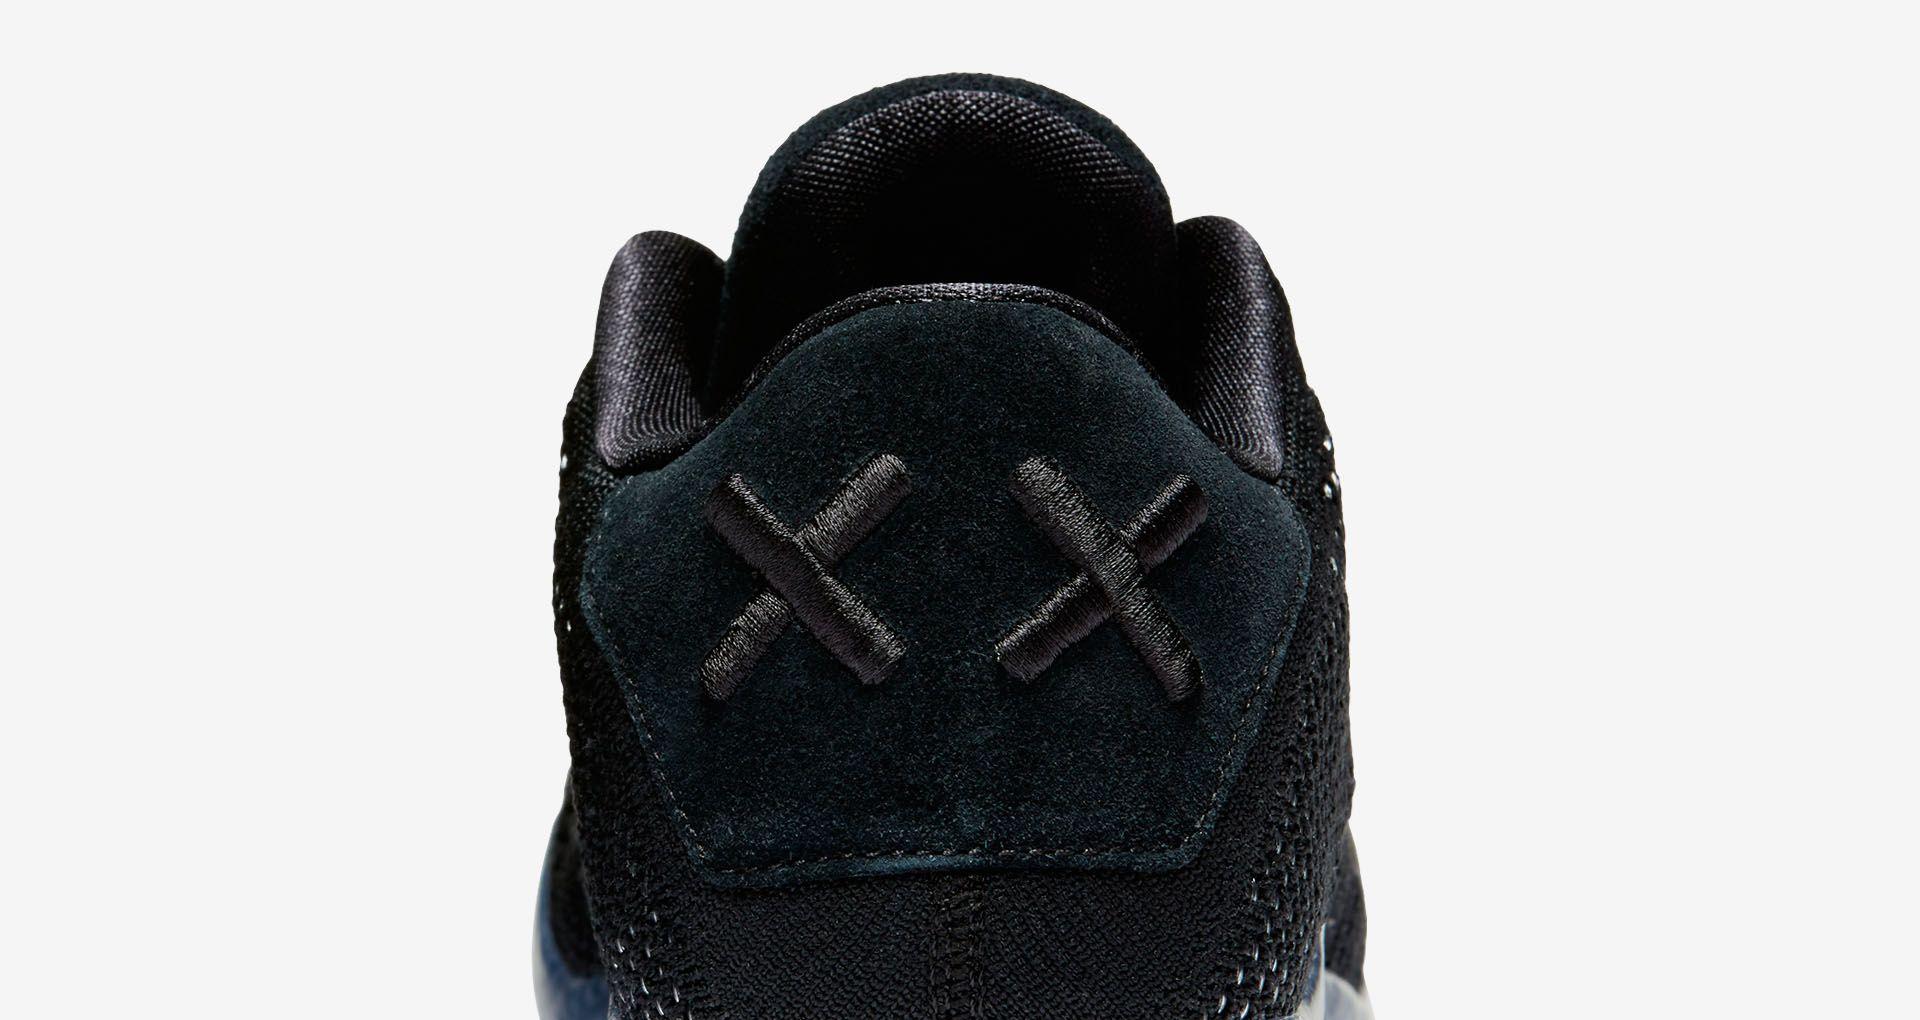 c456865f4247 Nike Kobe 11 Elite Low  Black Space  Release Date. Nike+ SNKRS